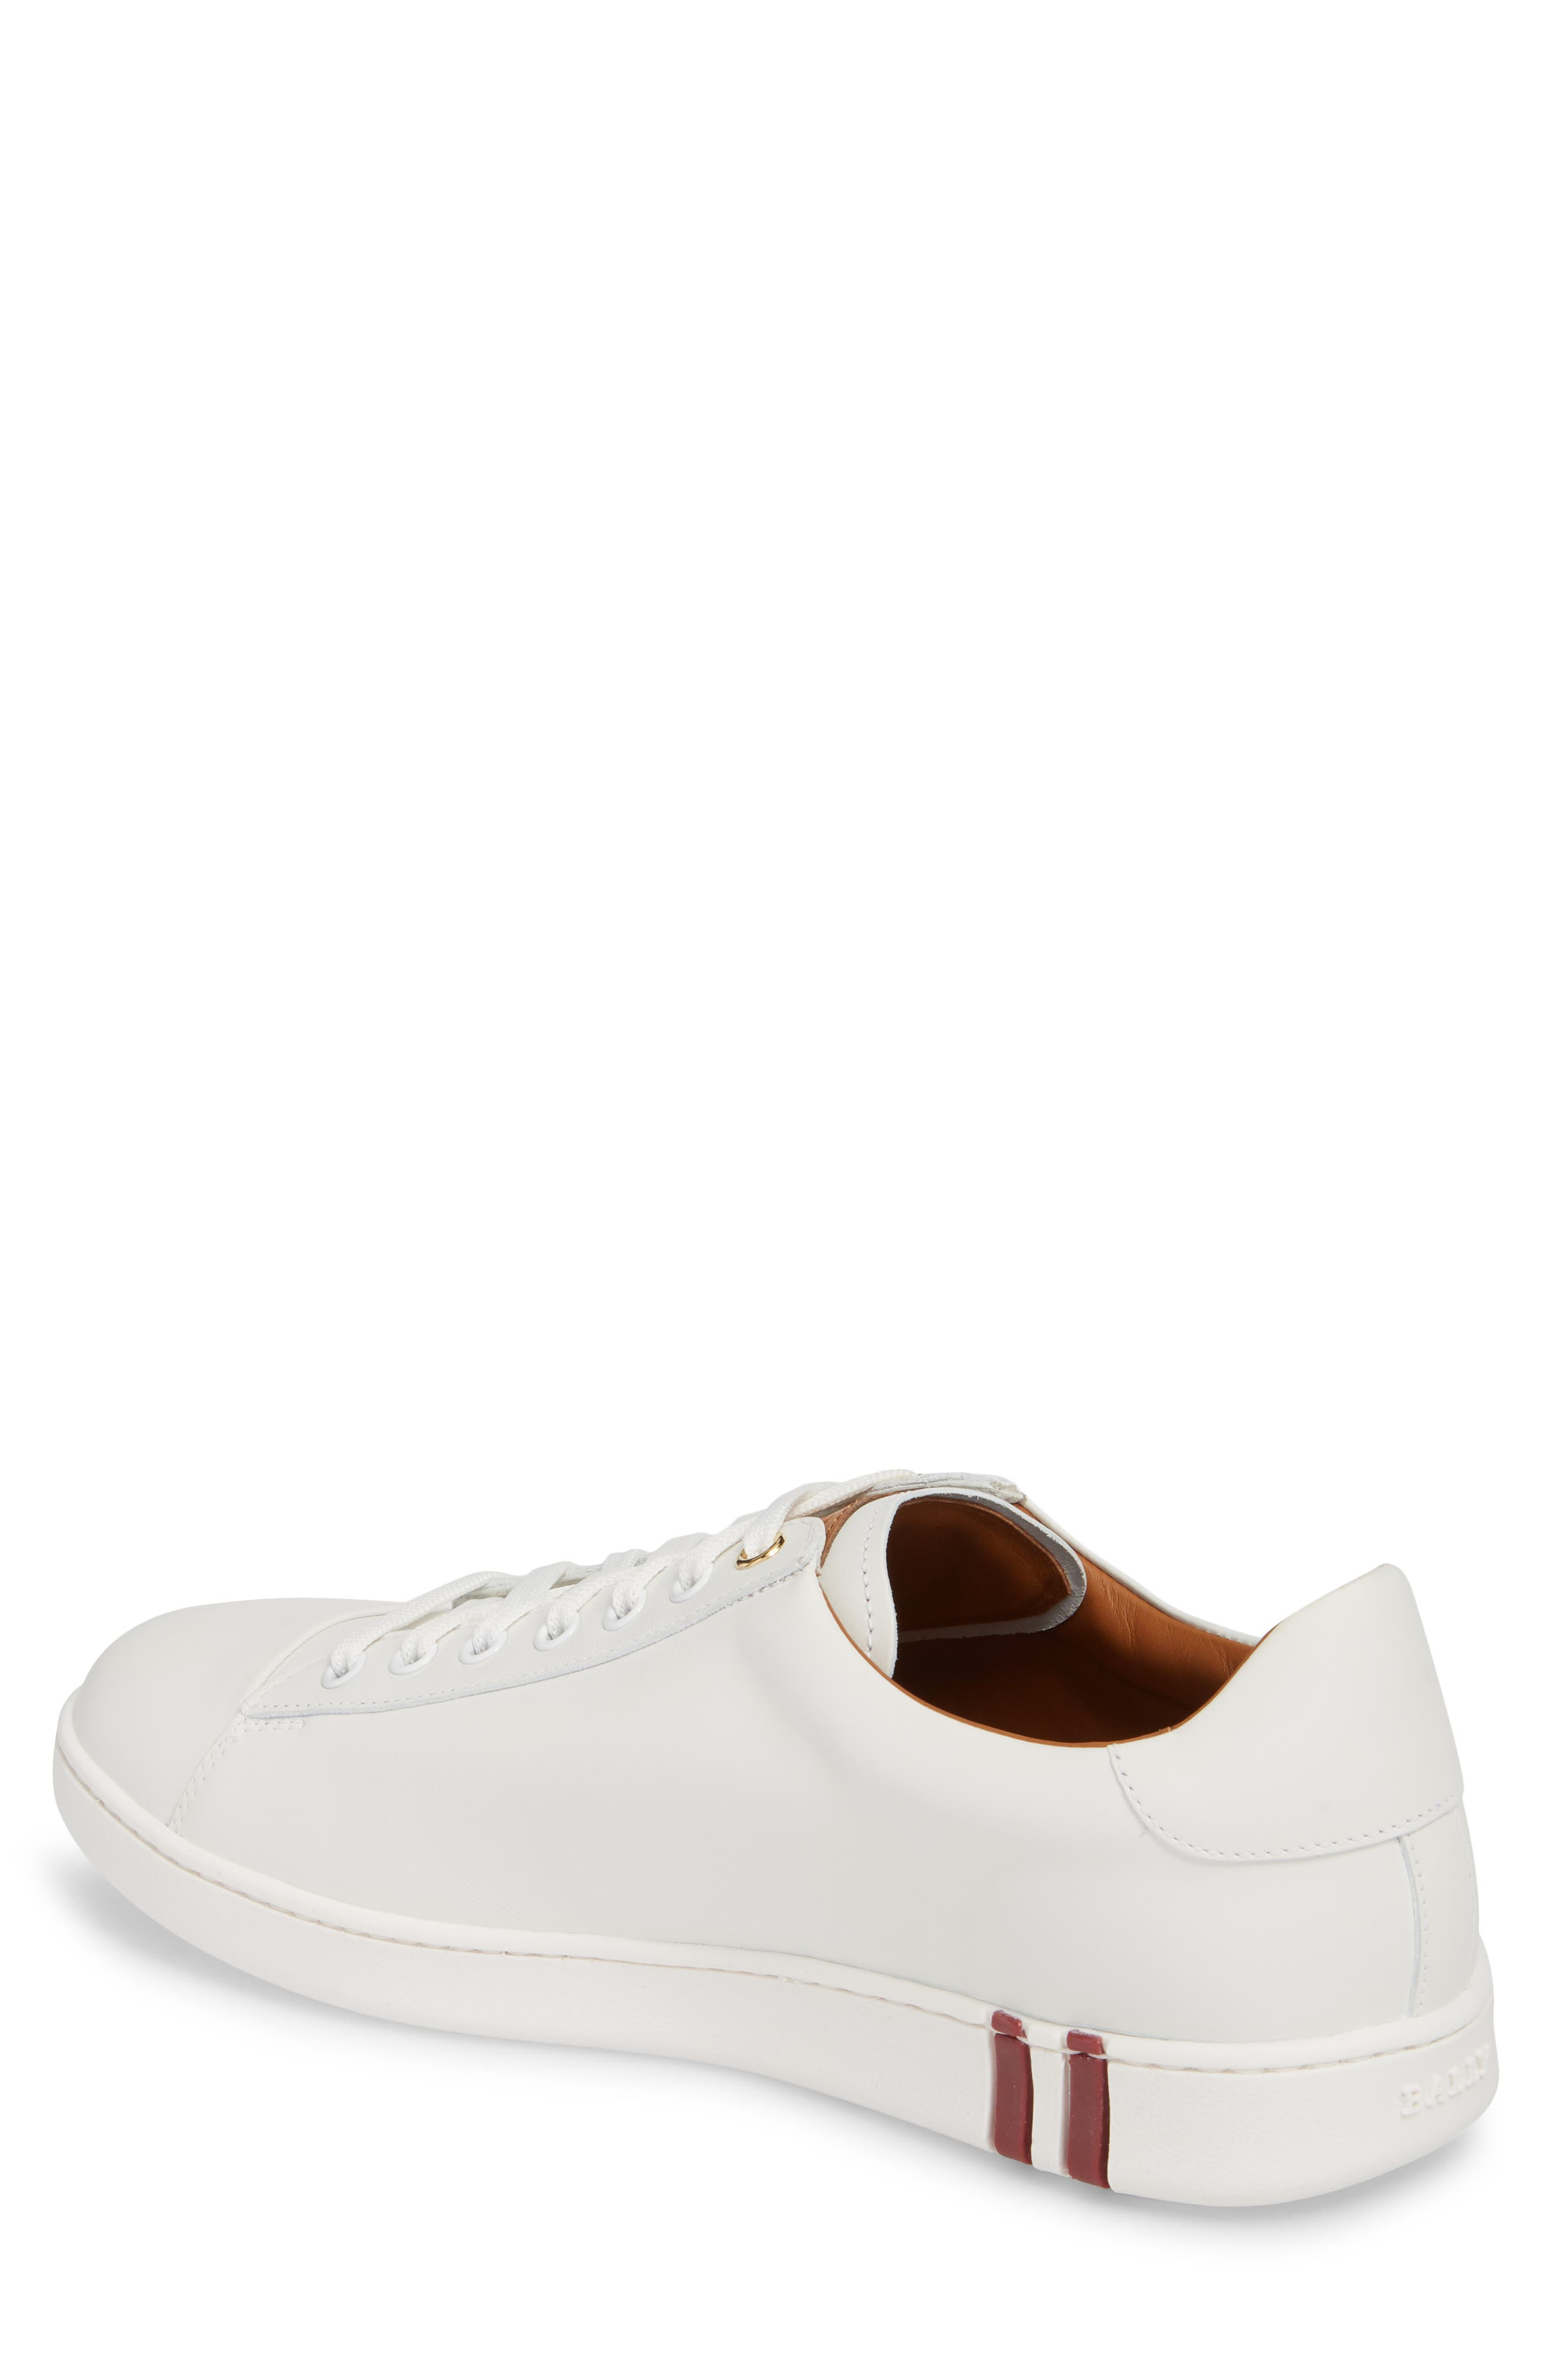 Winston Low Top Sneaker,                             Alternate thumbnail 2, color,                             WHITE